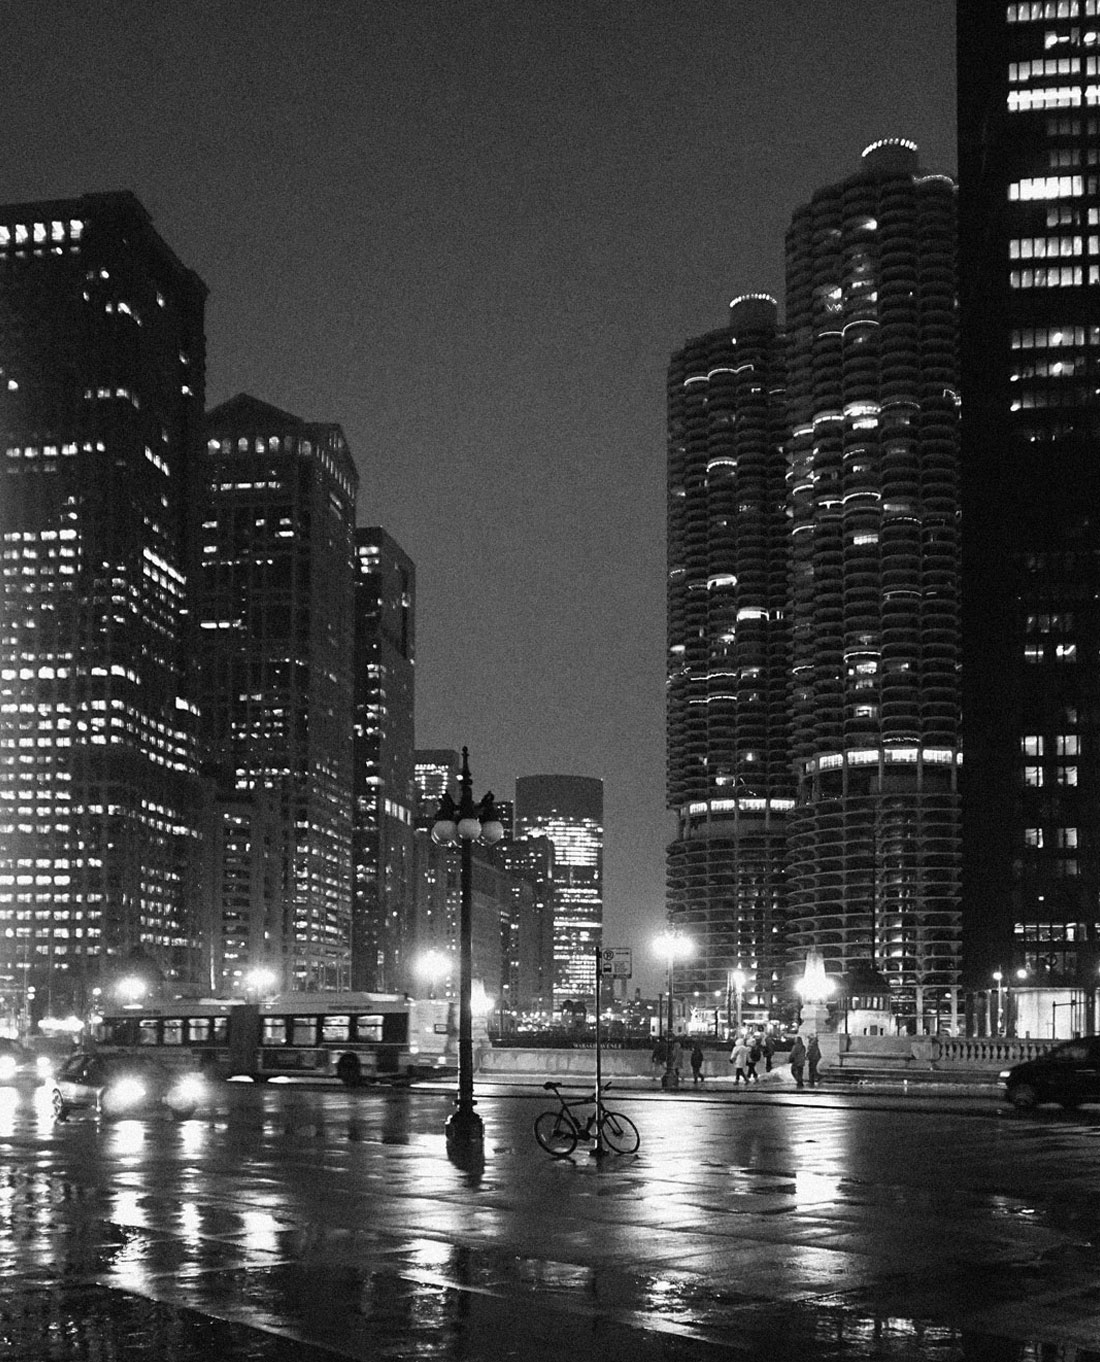 chicago-image.jpg